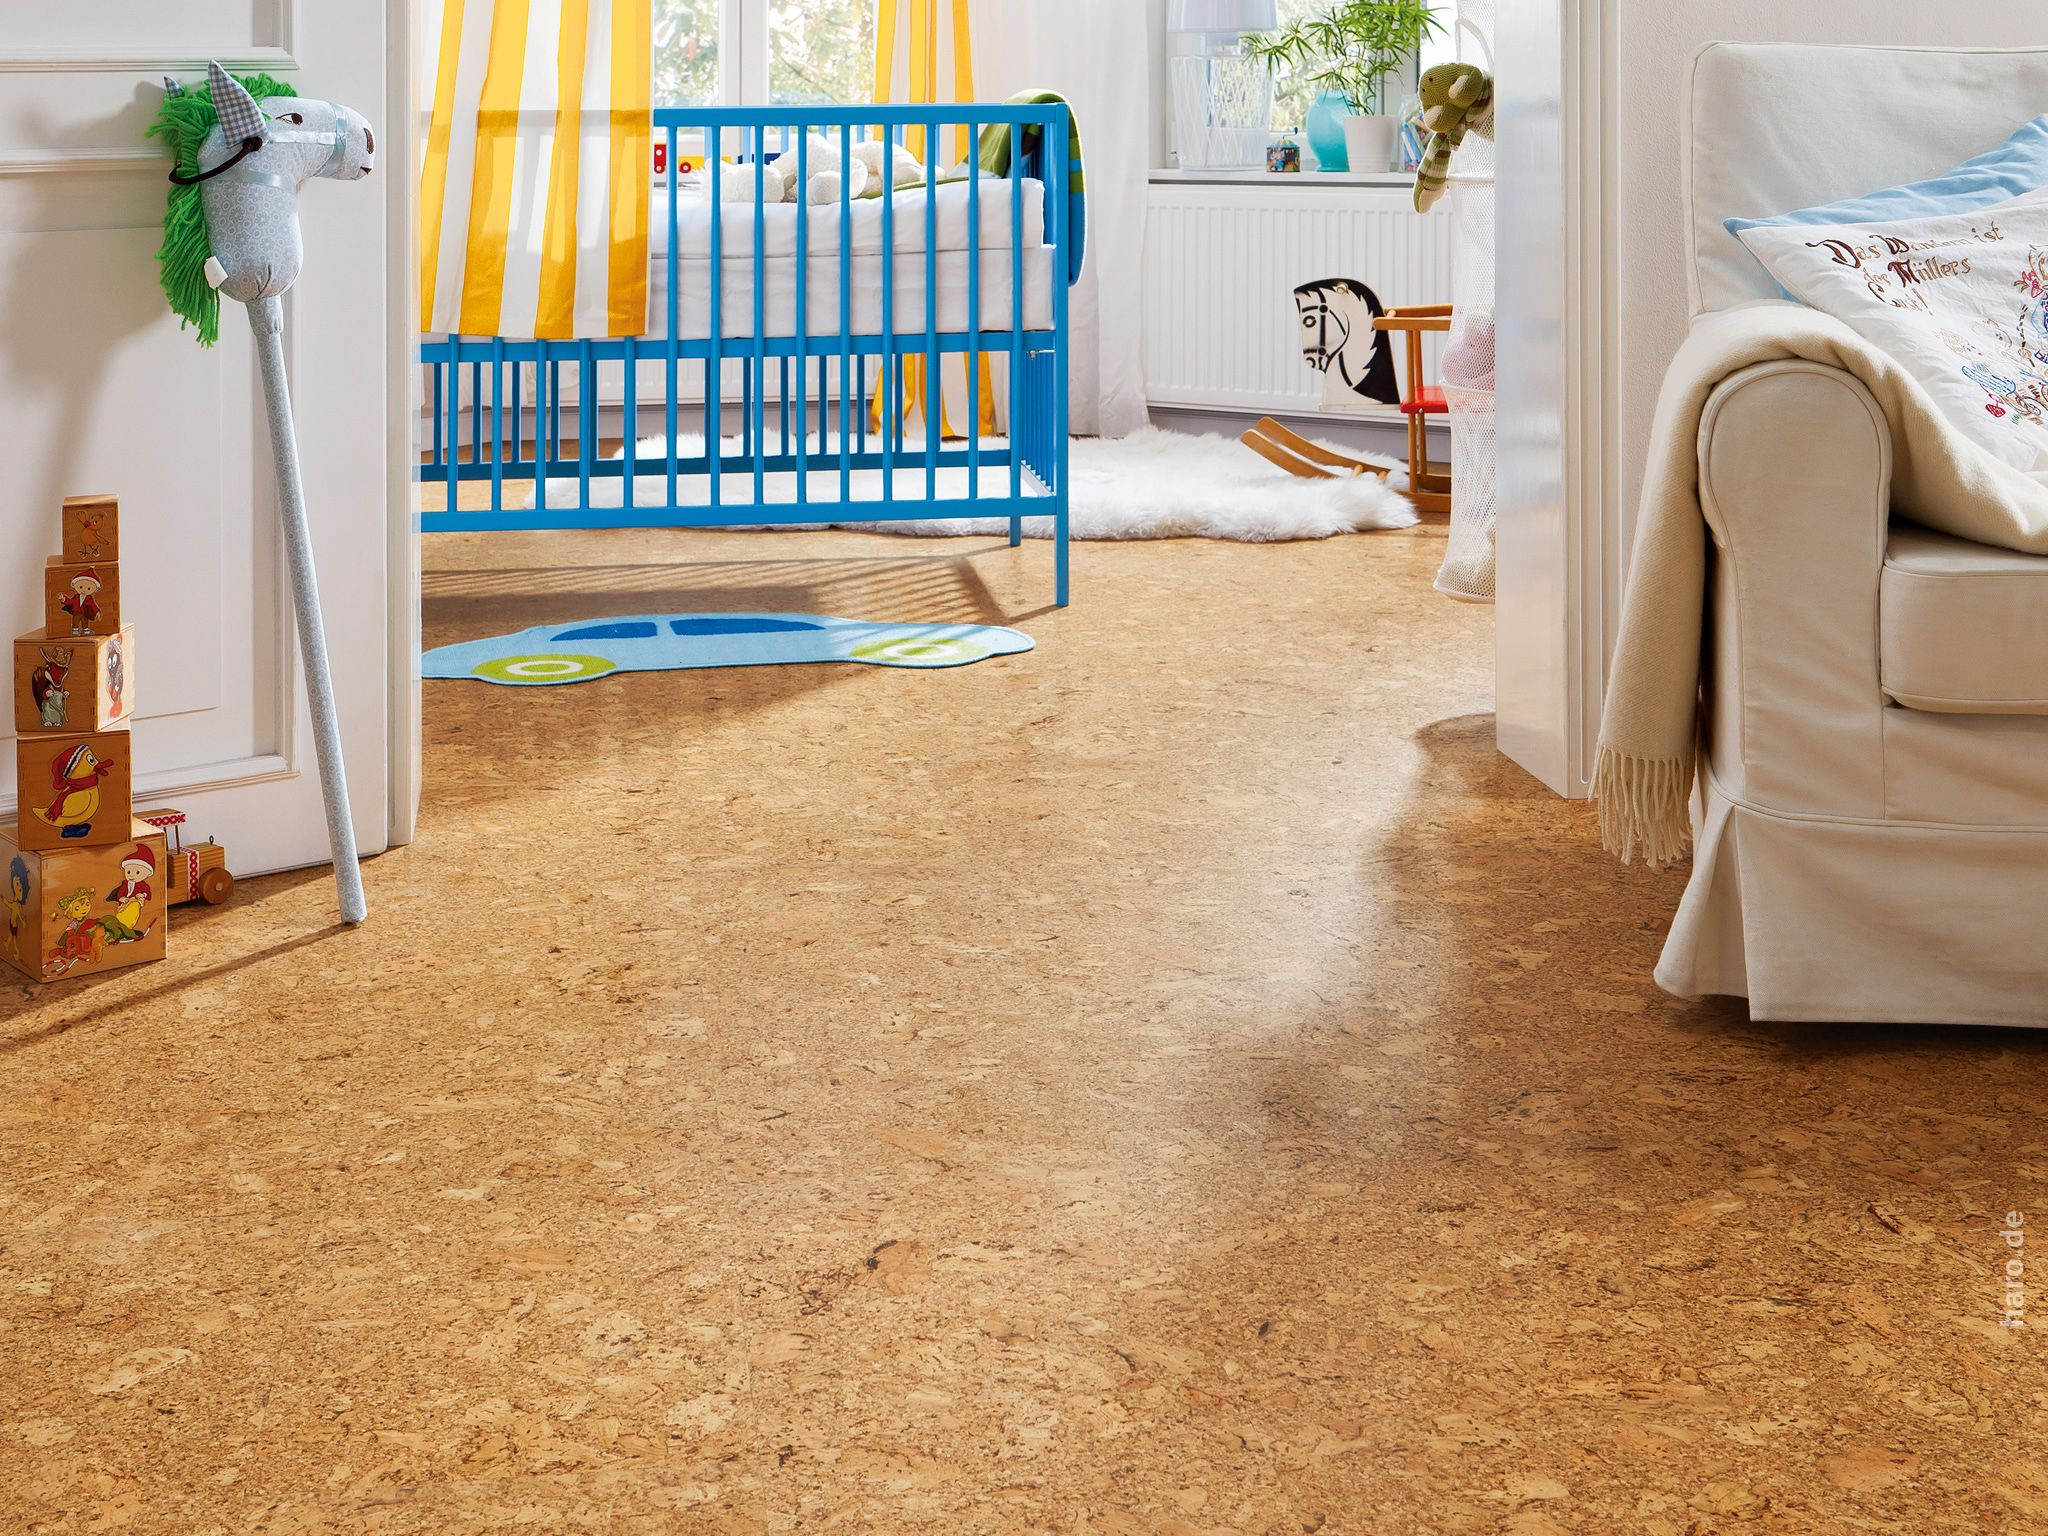 Vinyl Fußboden Kinderzimmer ~ Haro corkett lagos natur cork floor korkboden korkboden kork